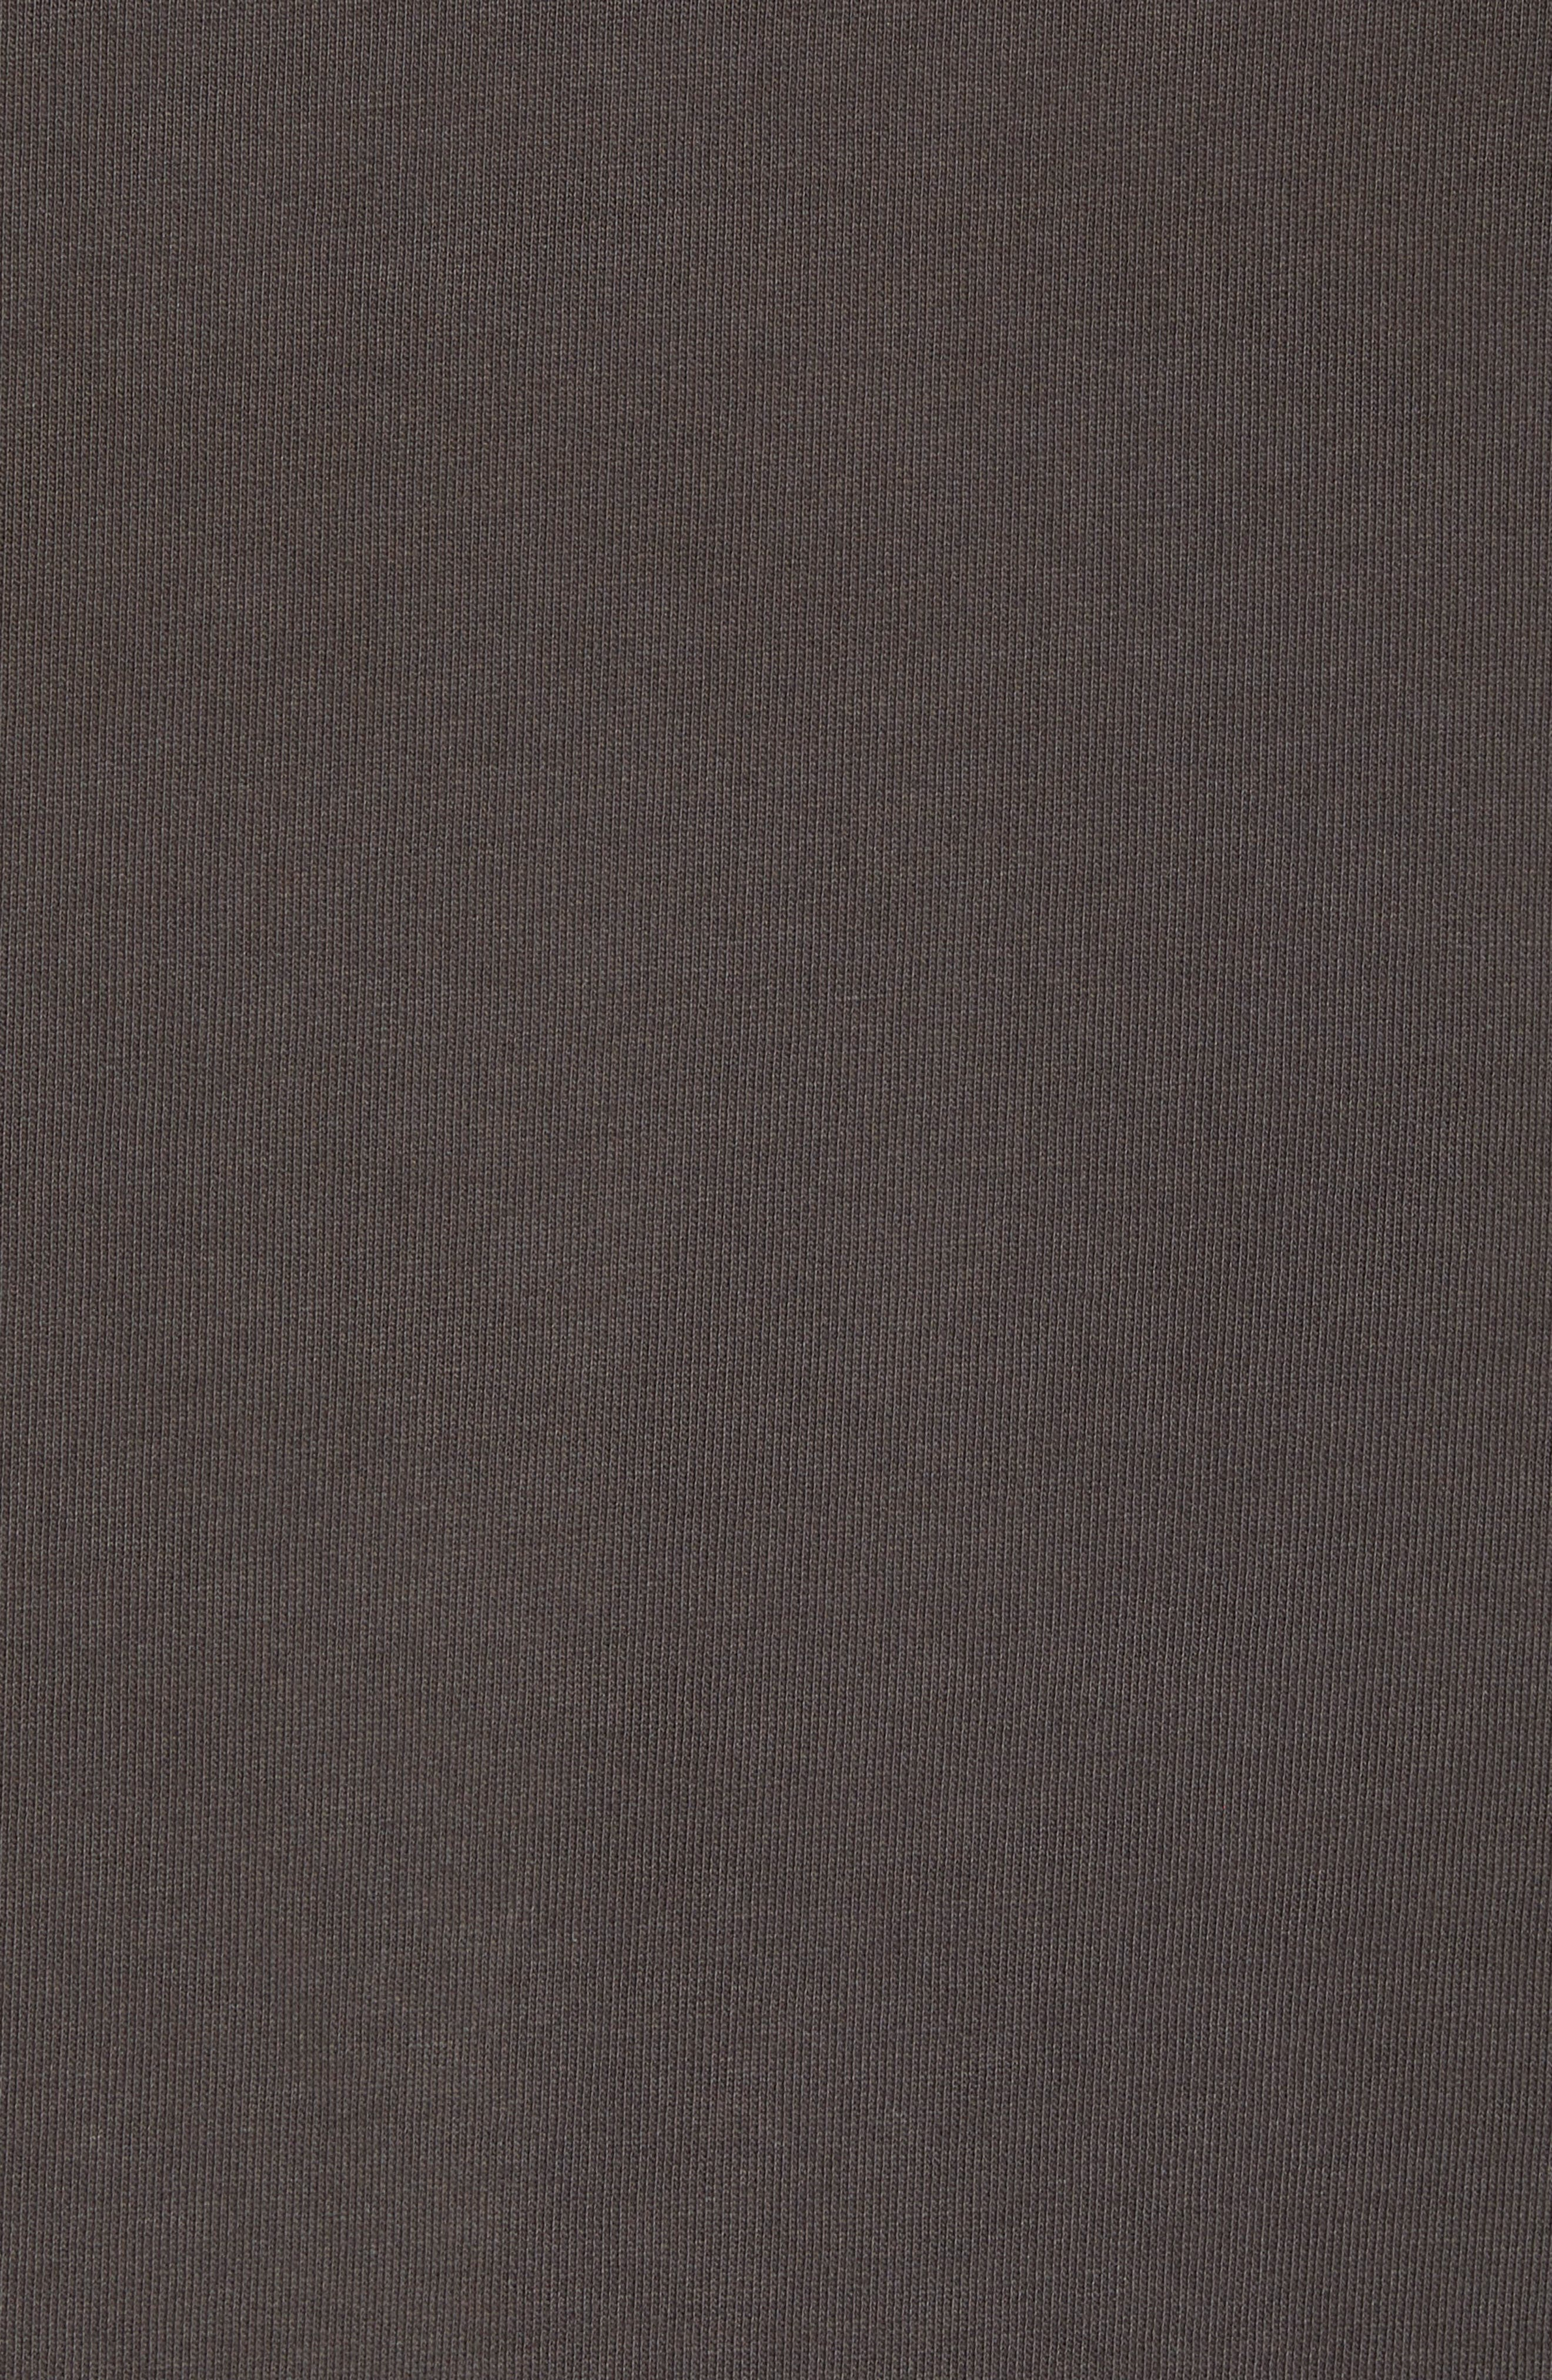 Trevor Slim Fit Crewneck Shirt,                             Alternate thumbnail 5, color,                             032